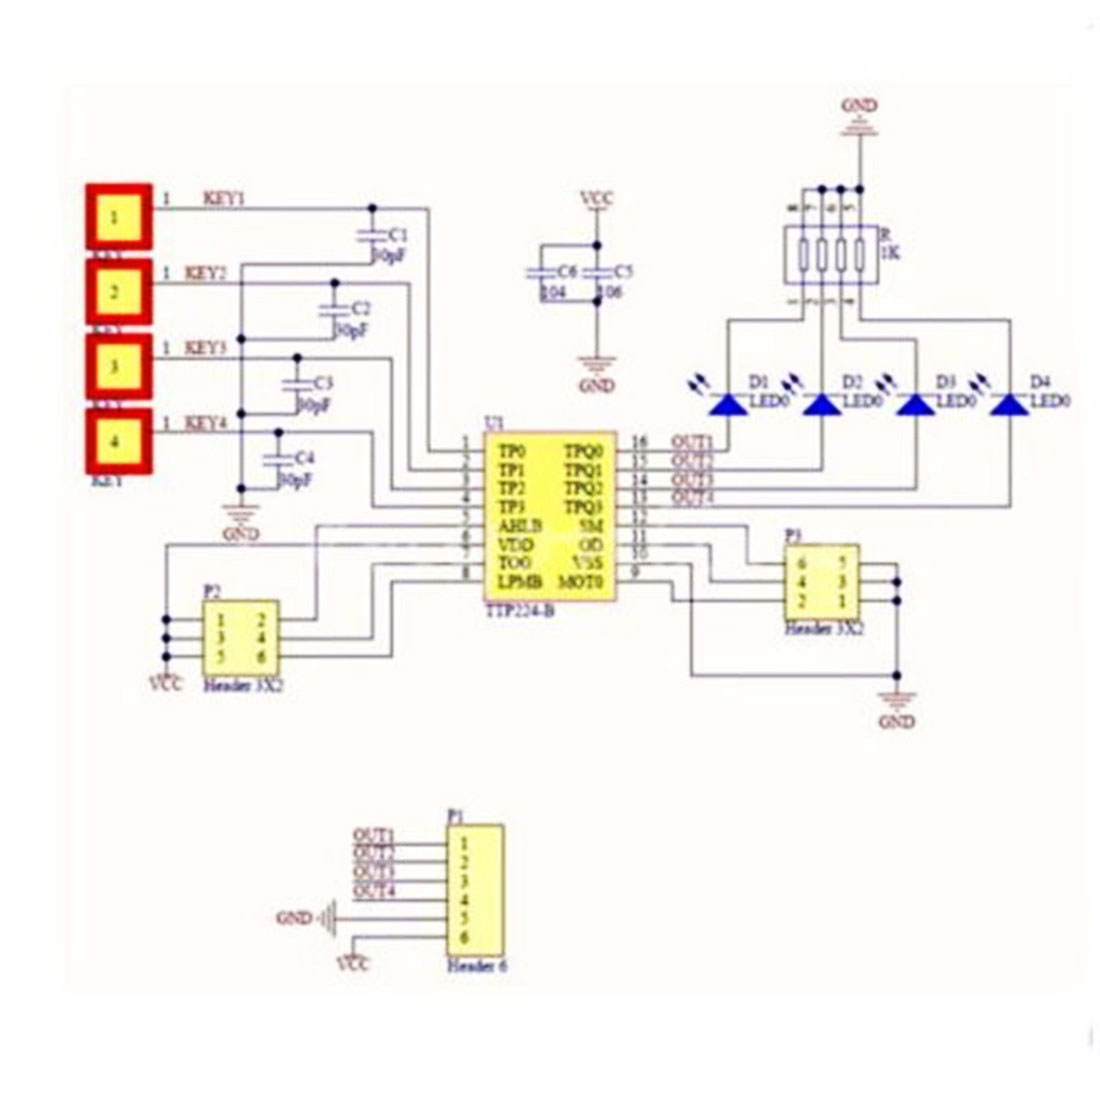 Channel Rf Remote Control Circuit Diagram Tattoo Designs - Wiring